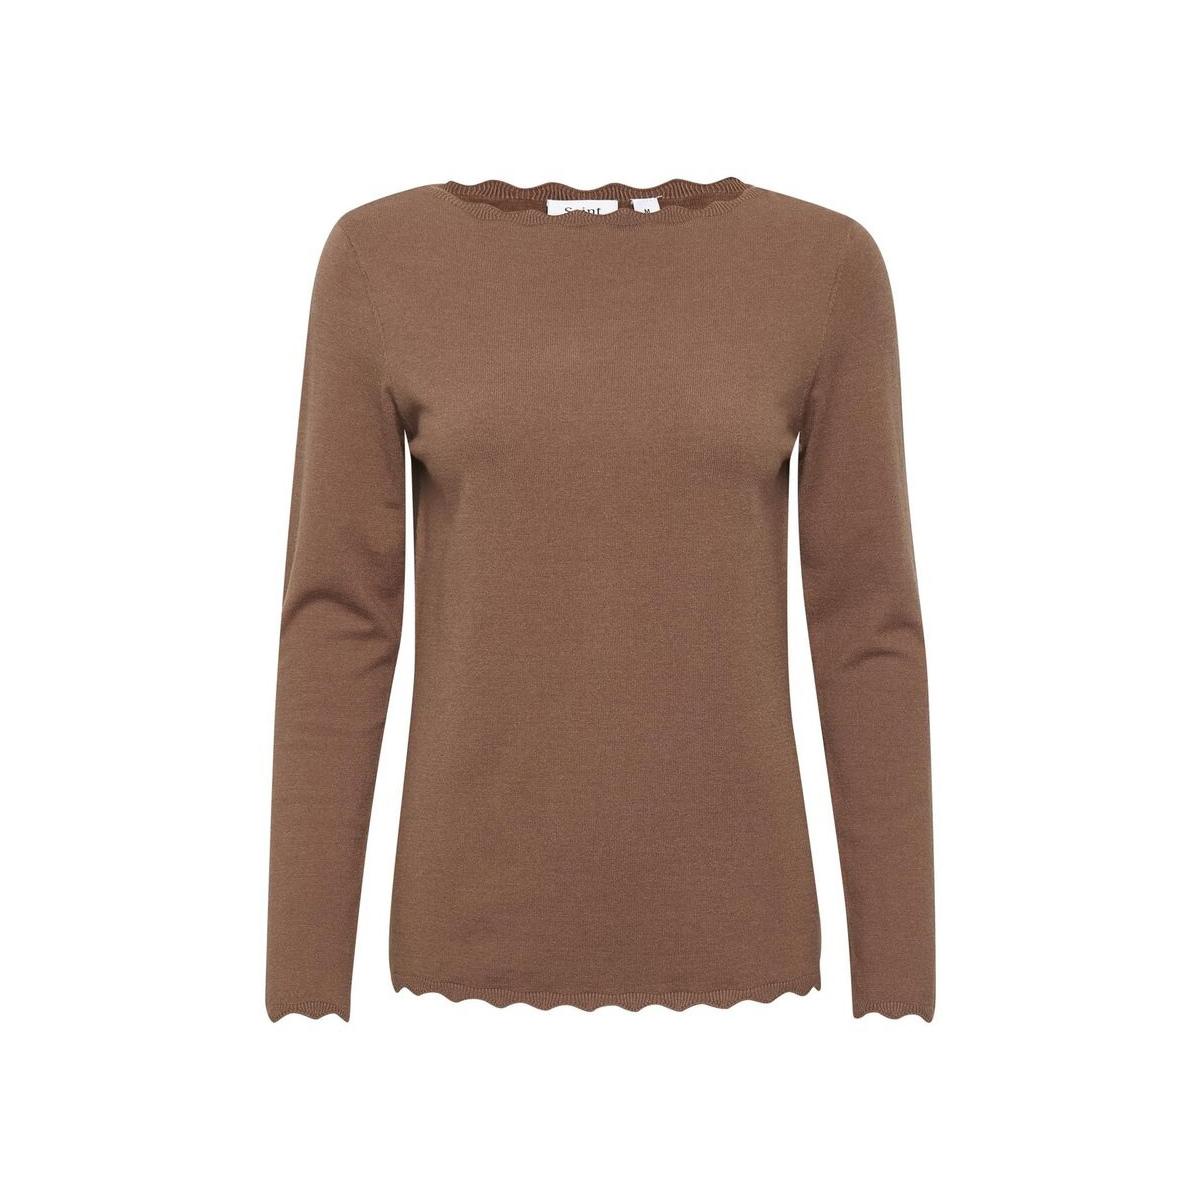 knitted blouse l s u2522 30501521 saint tropez trui 181030 thrush